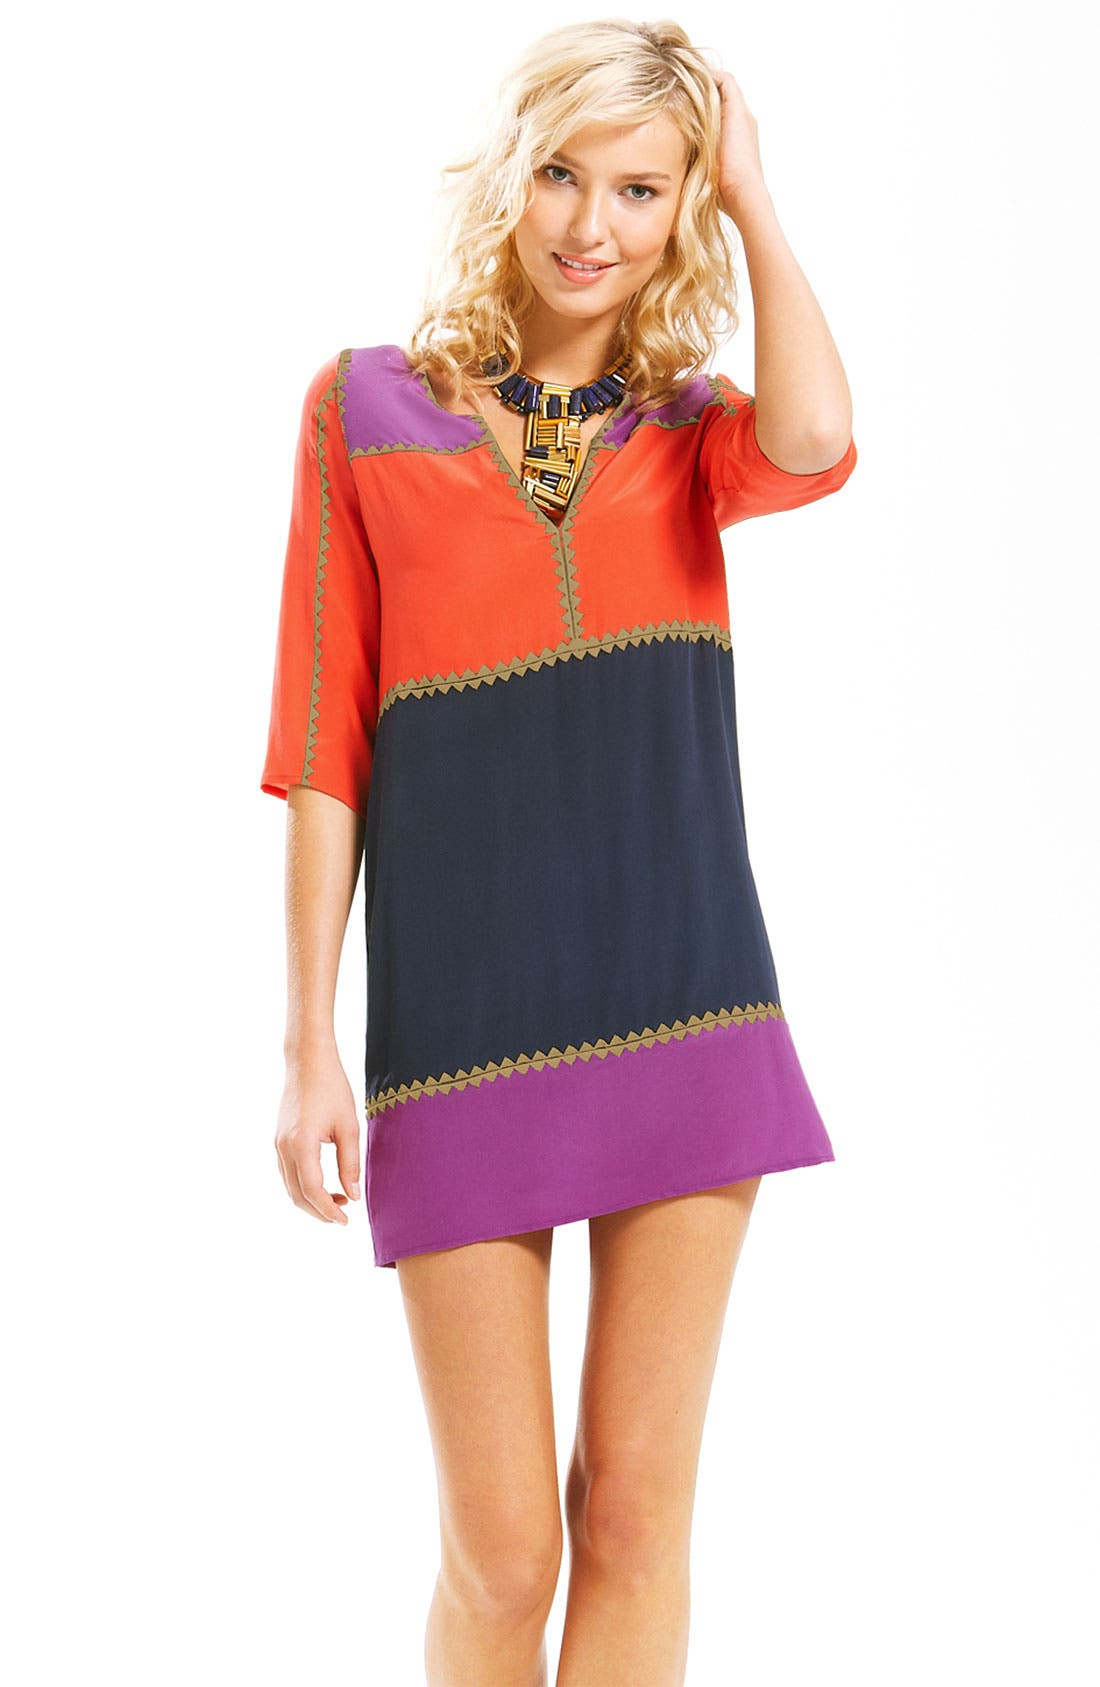 Main Image - BCBGMAXAZRIA 'Aidas' Colorblock Minidress